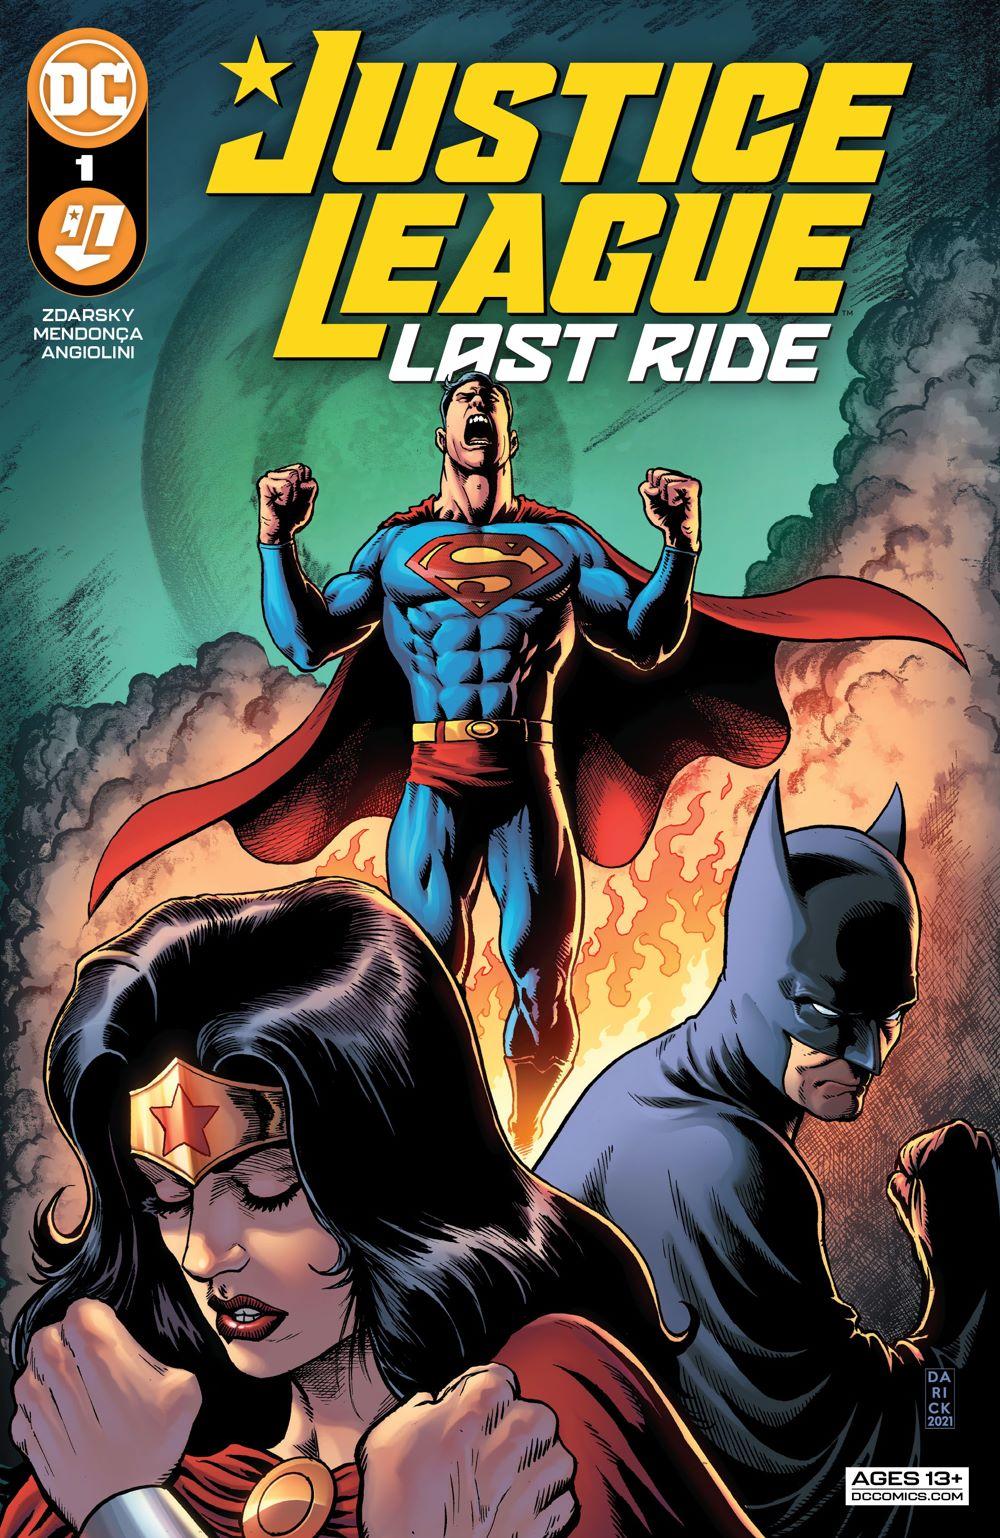 Justice-League-Last-Ride-1-1_60935bd0d614b1.68305800 ComicList Previews: JUSTICE LEAGUE LAST RIDE #1